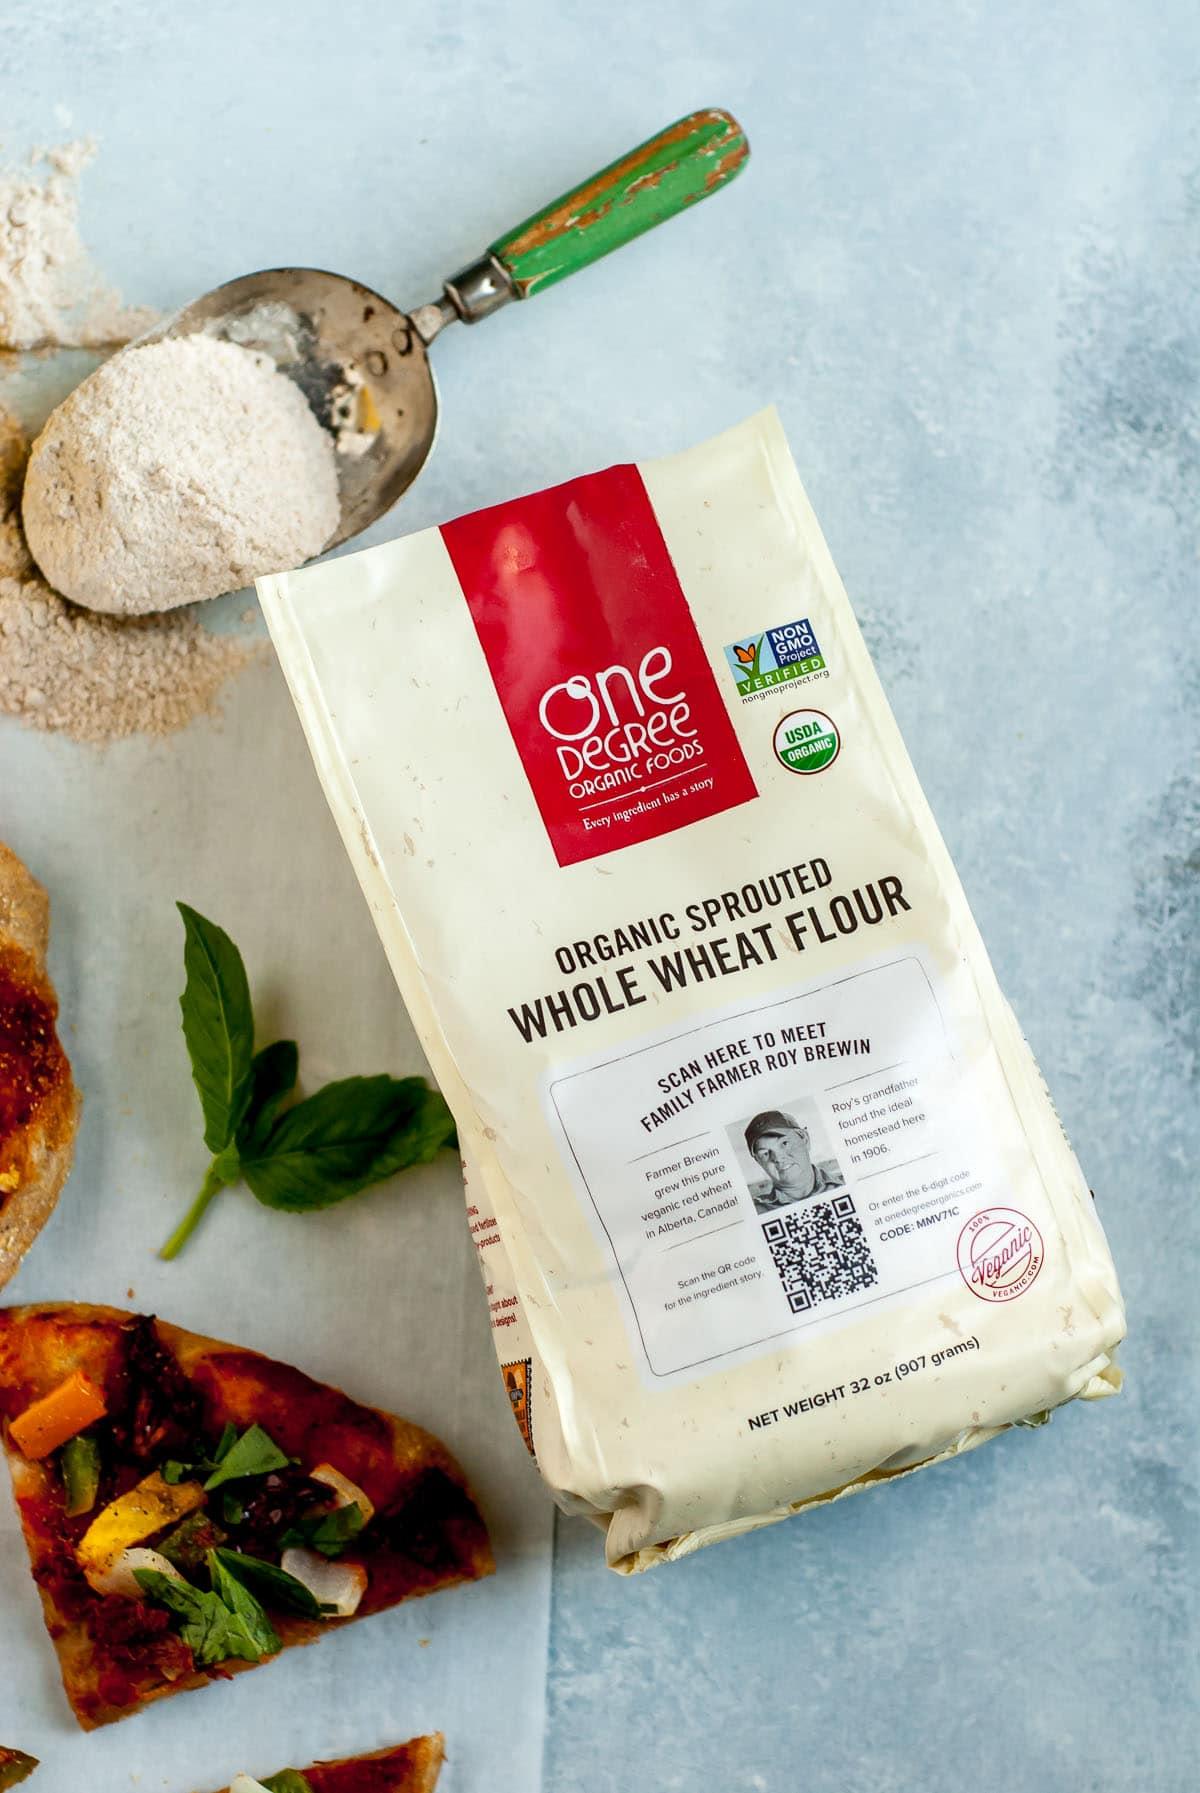 bag of whole wheat flour